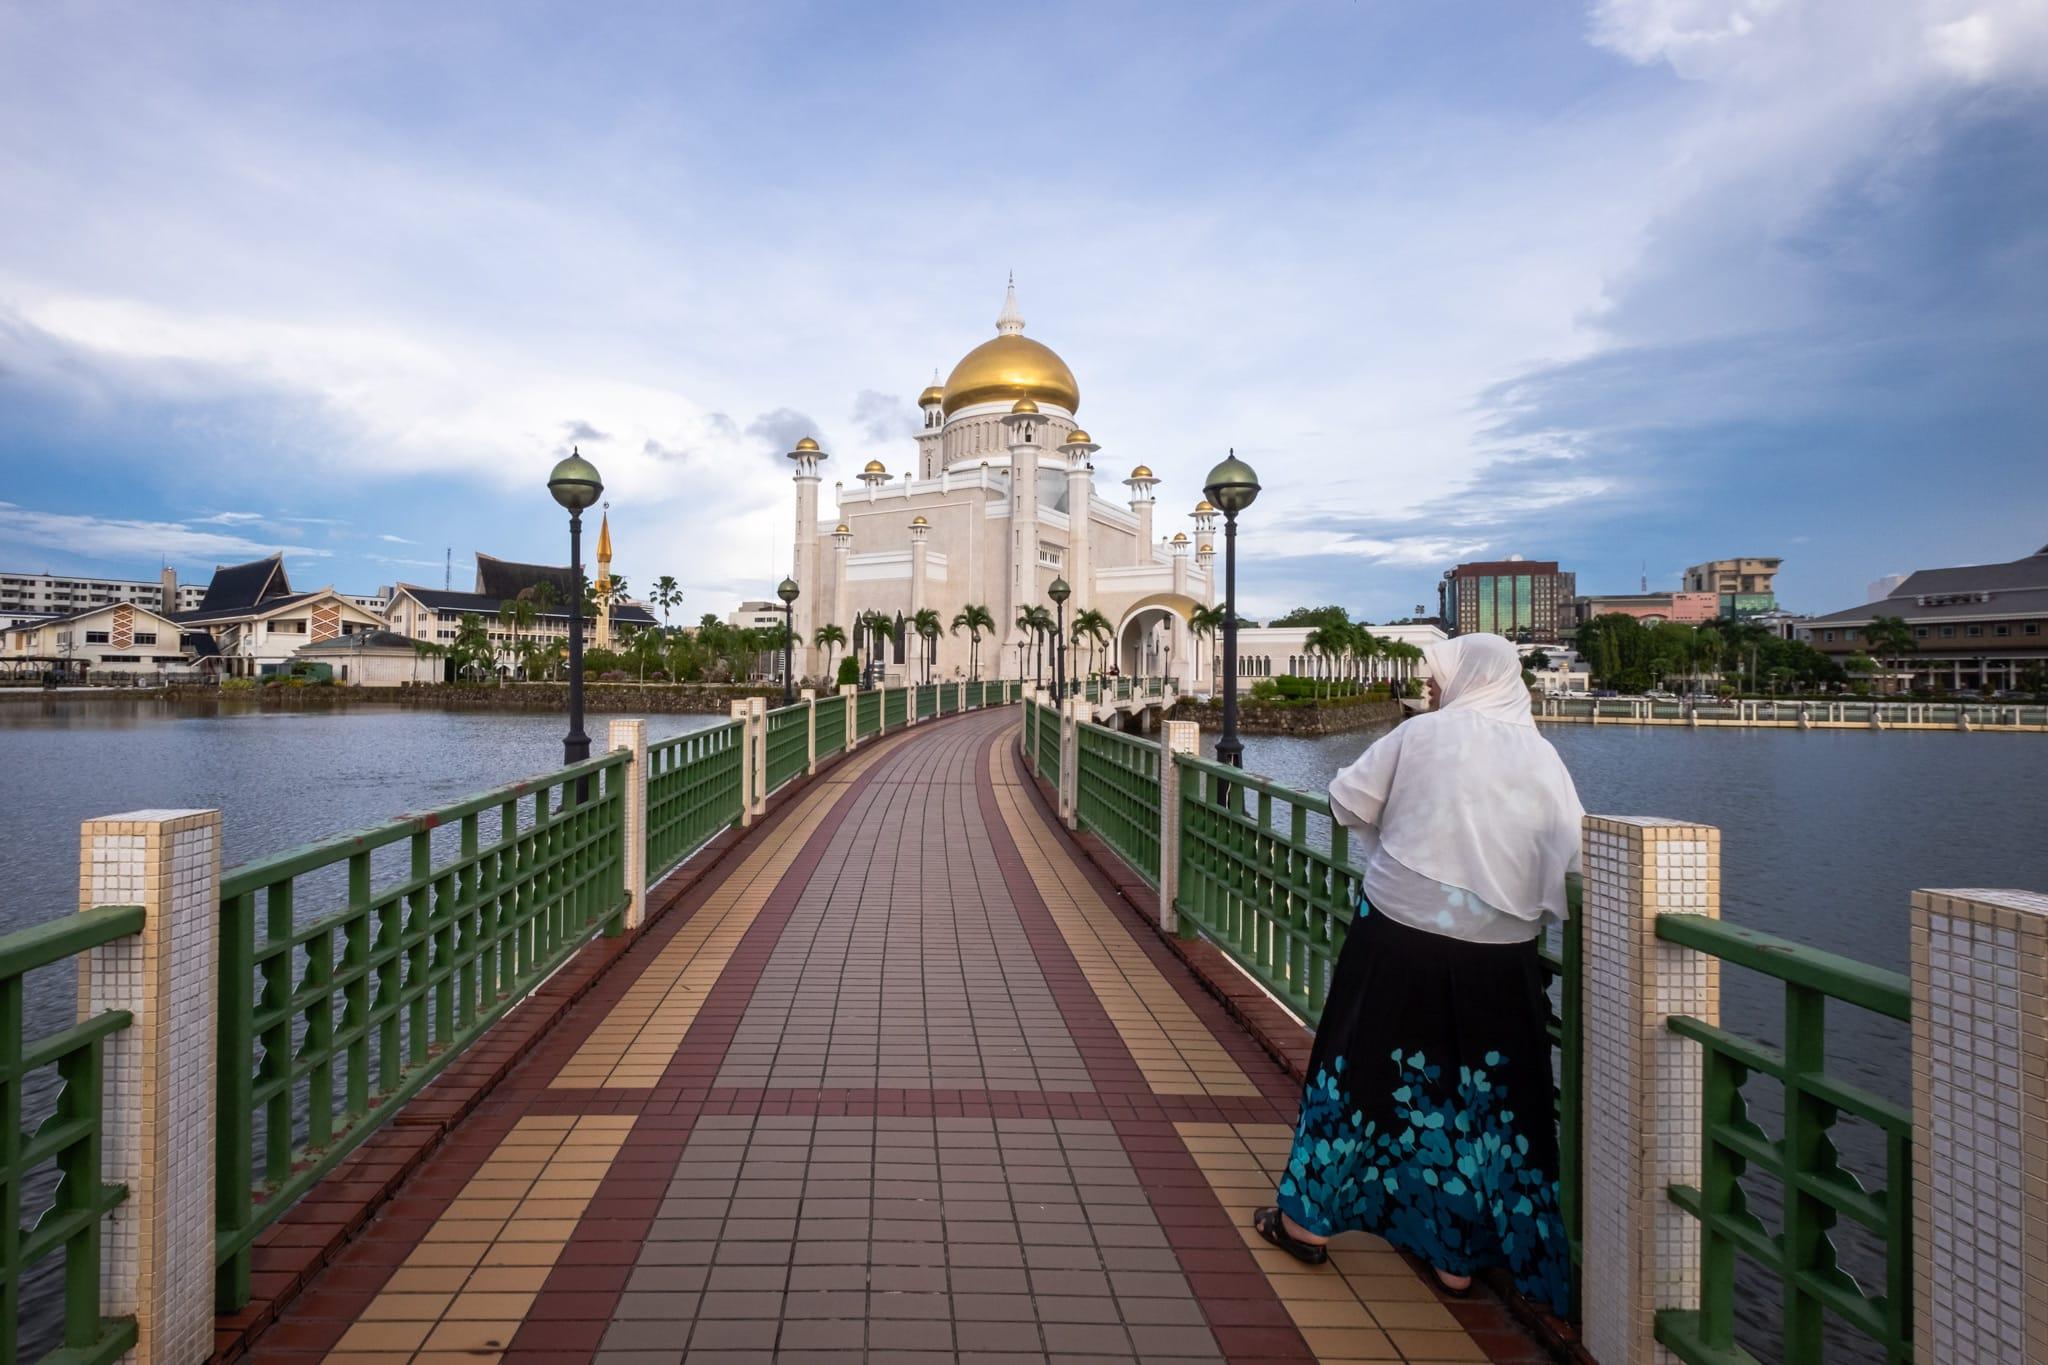 Follower of Islam on the bridge of the Sultan Omar Ali Saifuddien Mosque. Bandar Seri Begawan, Brunei.